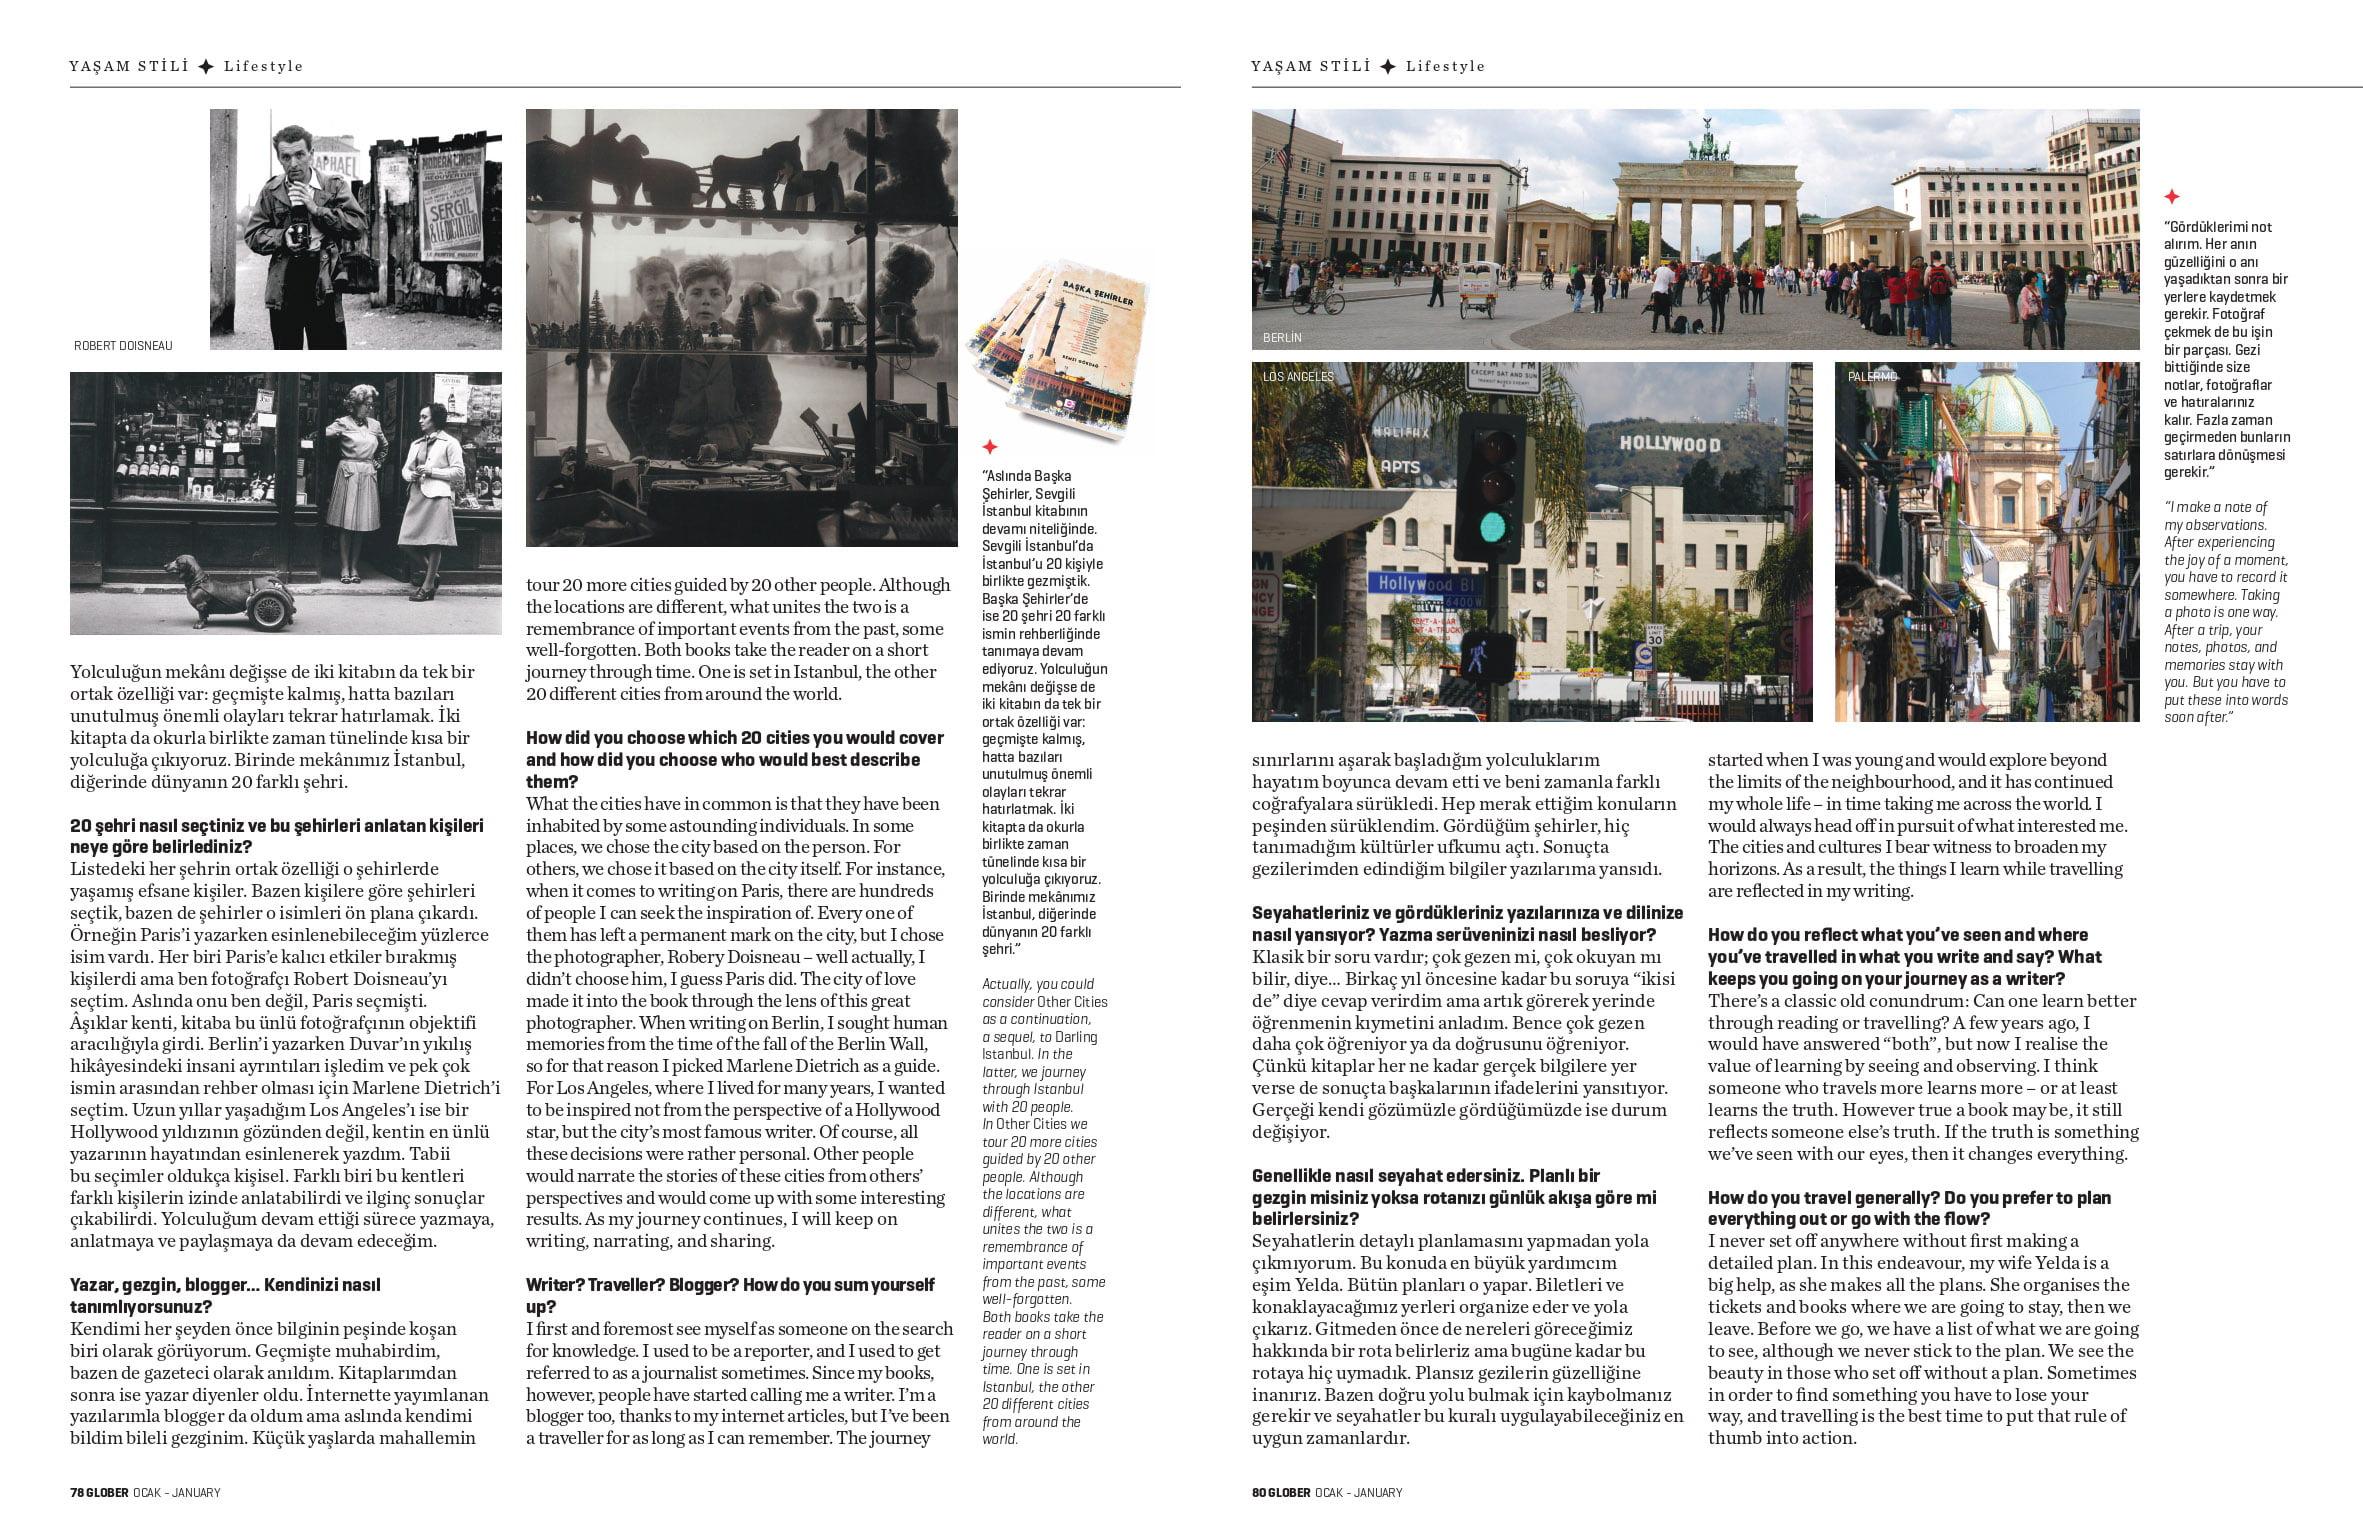 Glober Dergisi Başka Şehirler Remzi Gökdağ